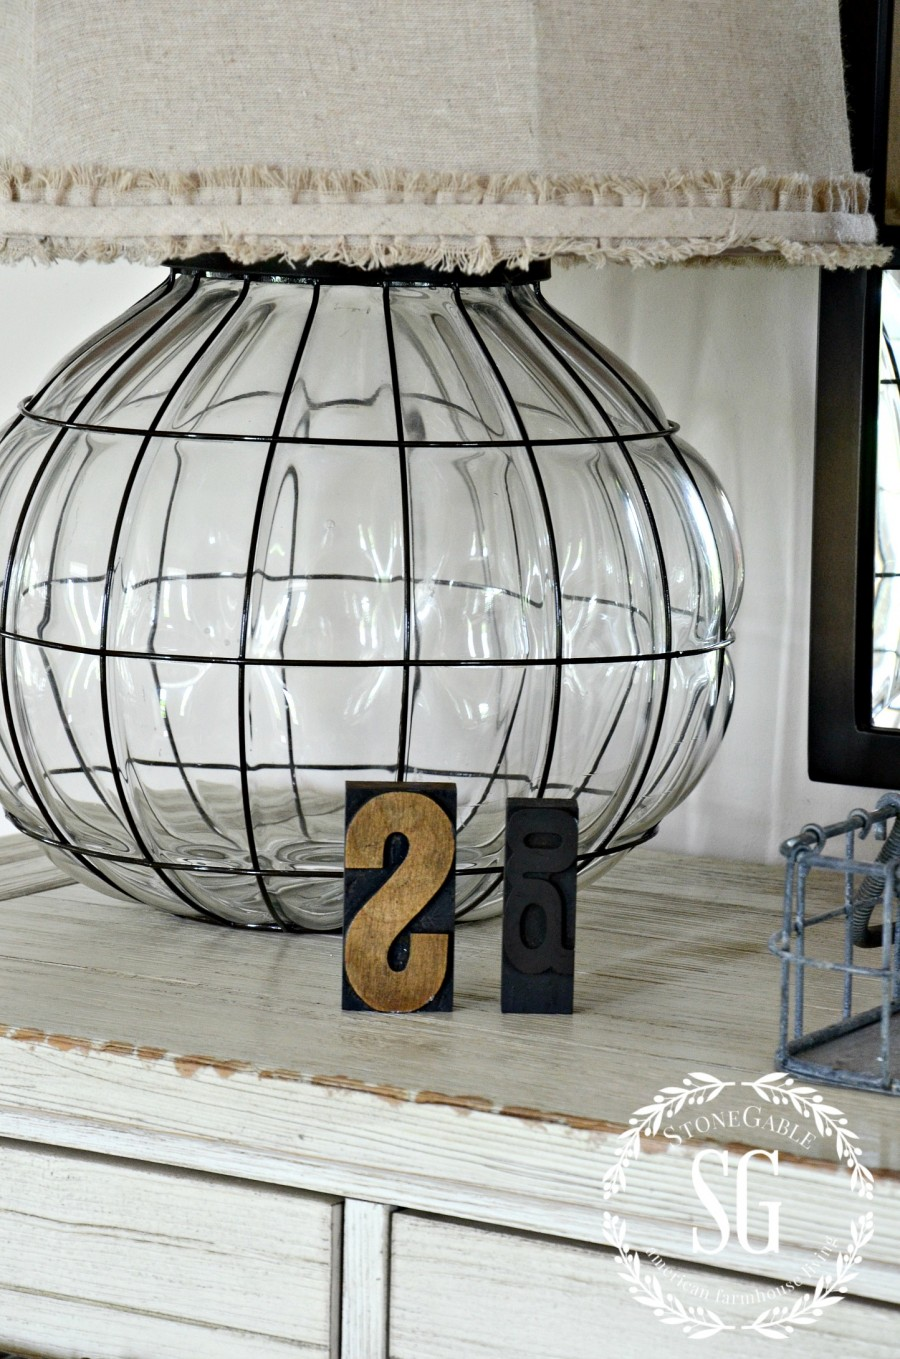 CREATING A WELCOMING FOYER-lamp in foyer-stonegableblog.com